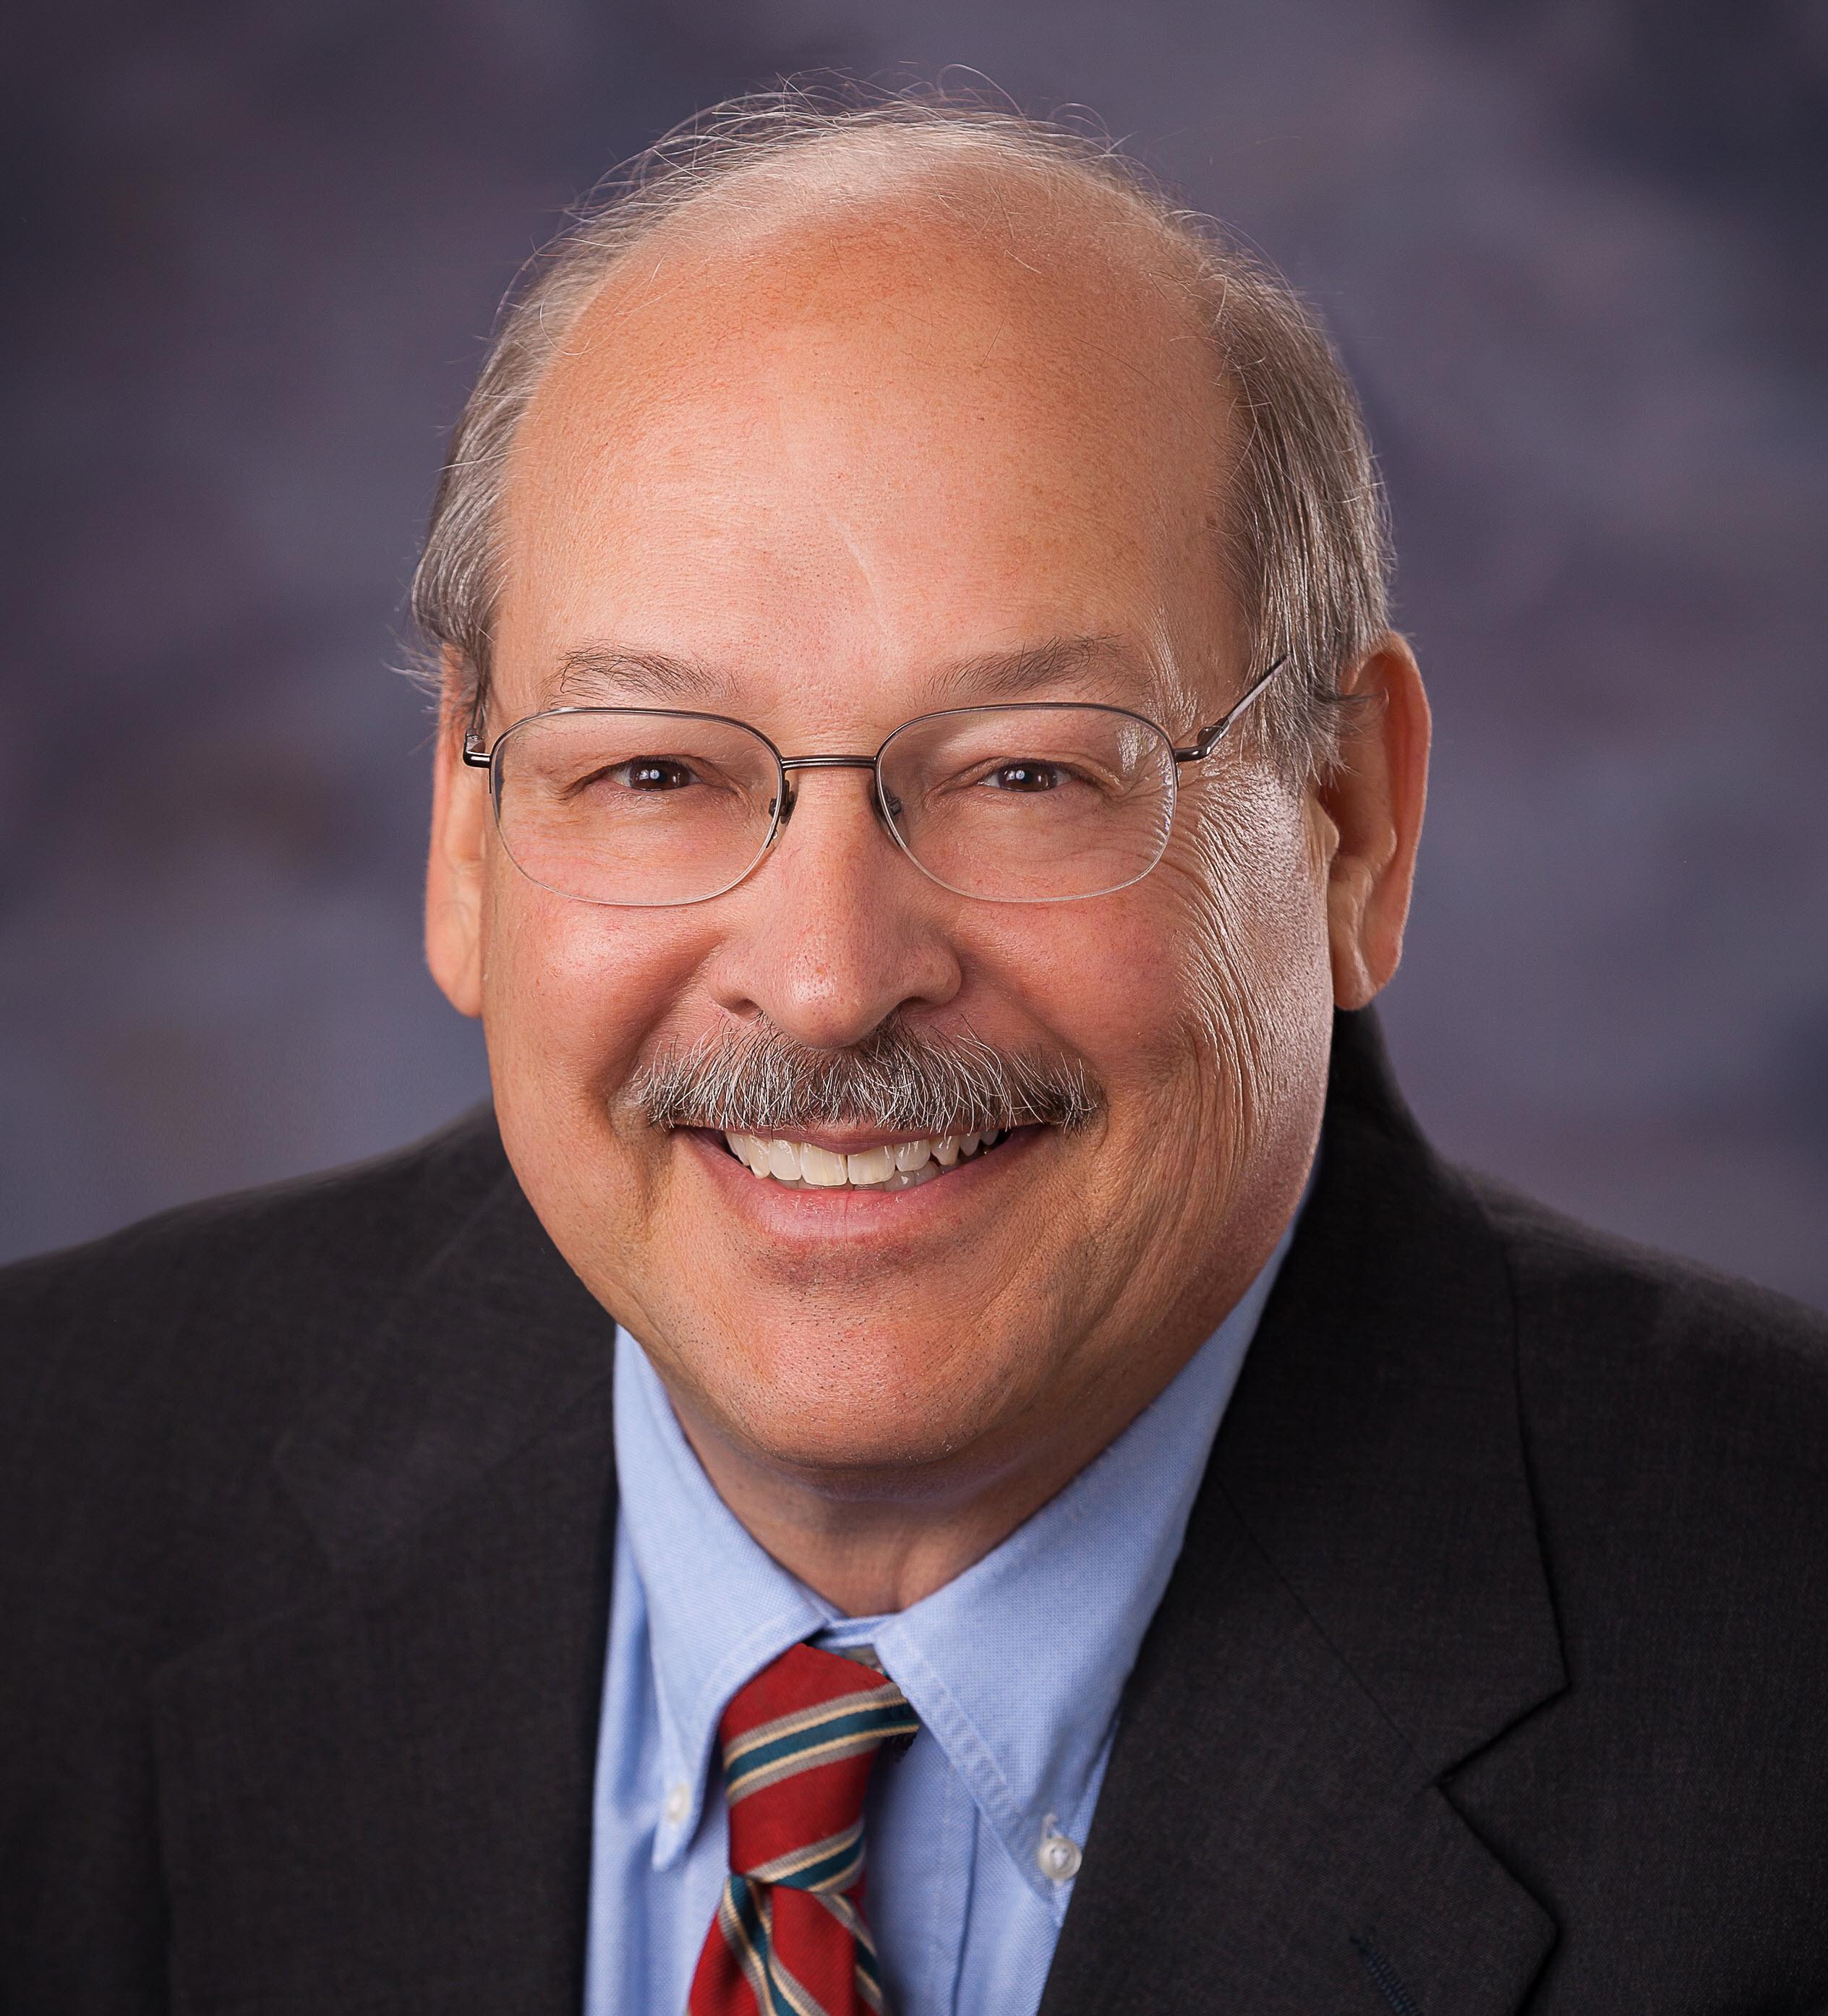 George Garklavs